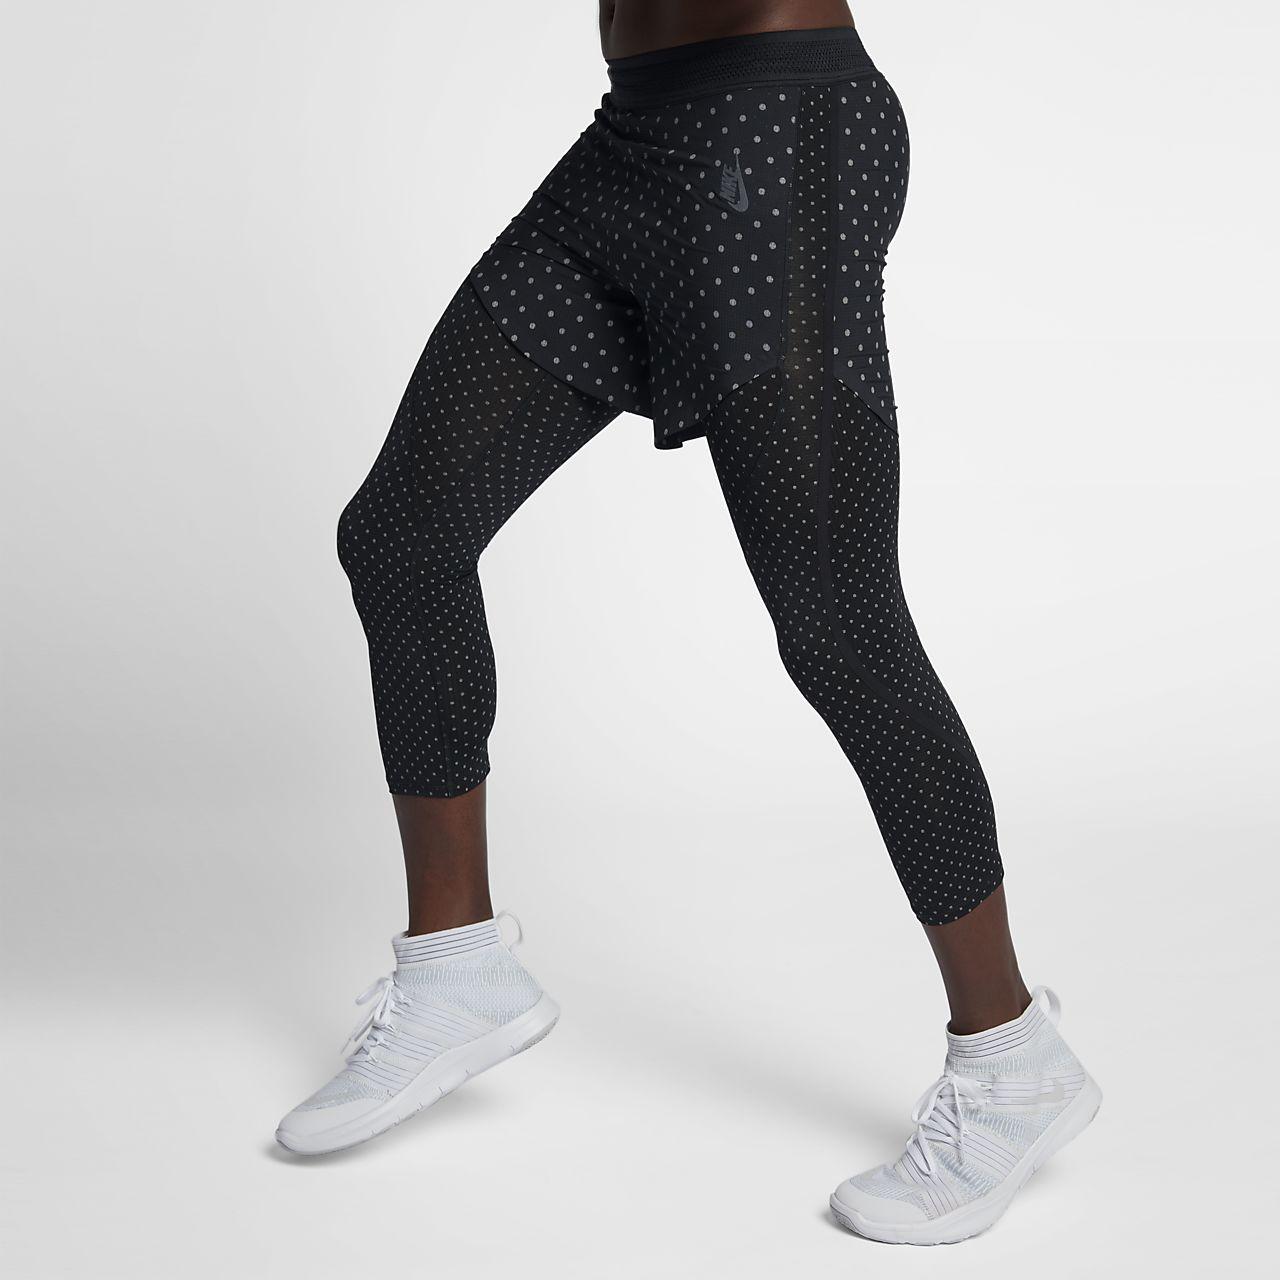 ... NikeLab Essentials Training All-Over Print Men's Hybrid Shorts